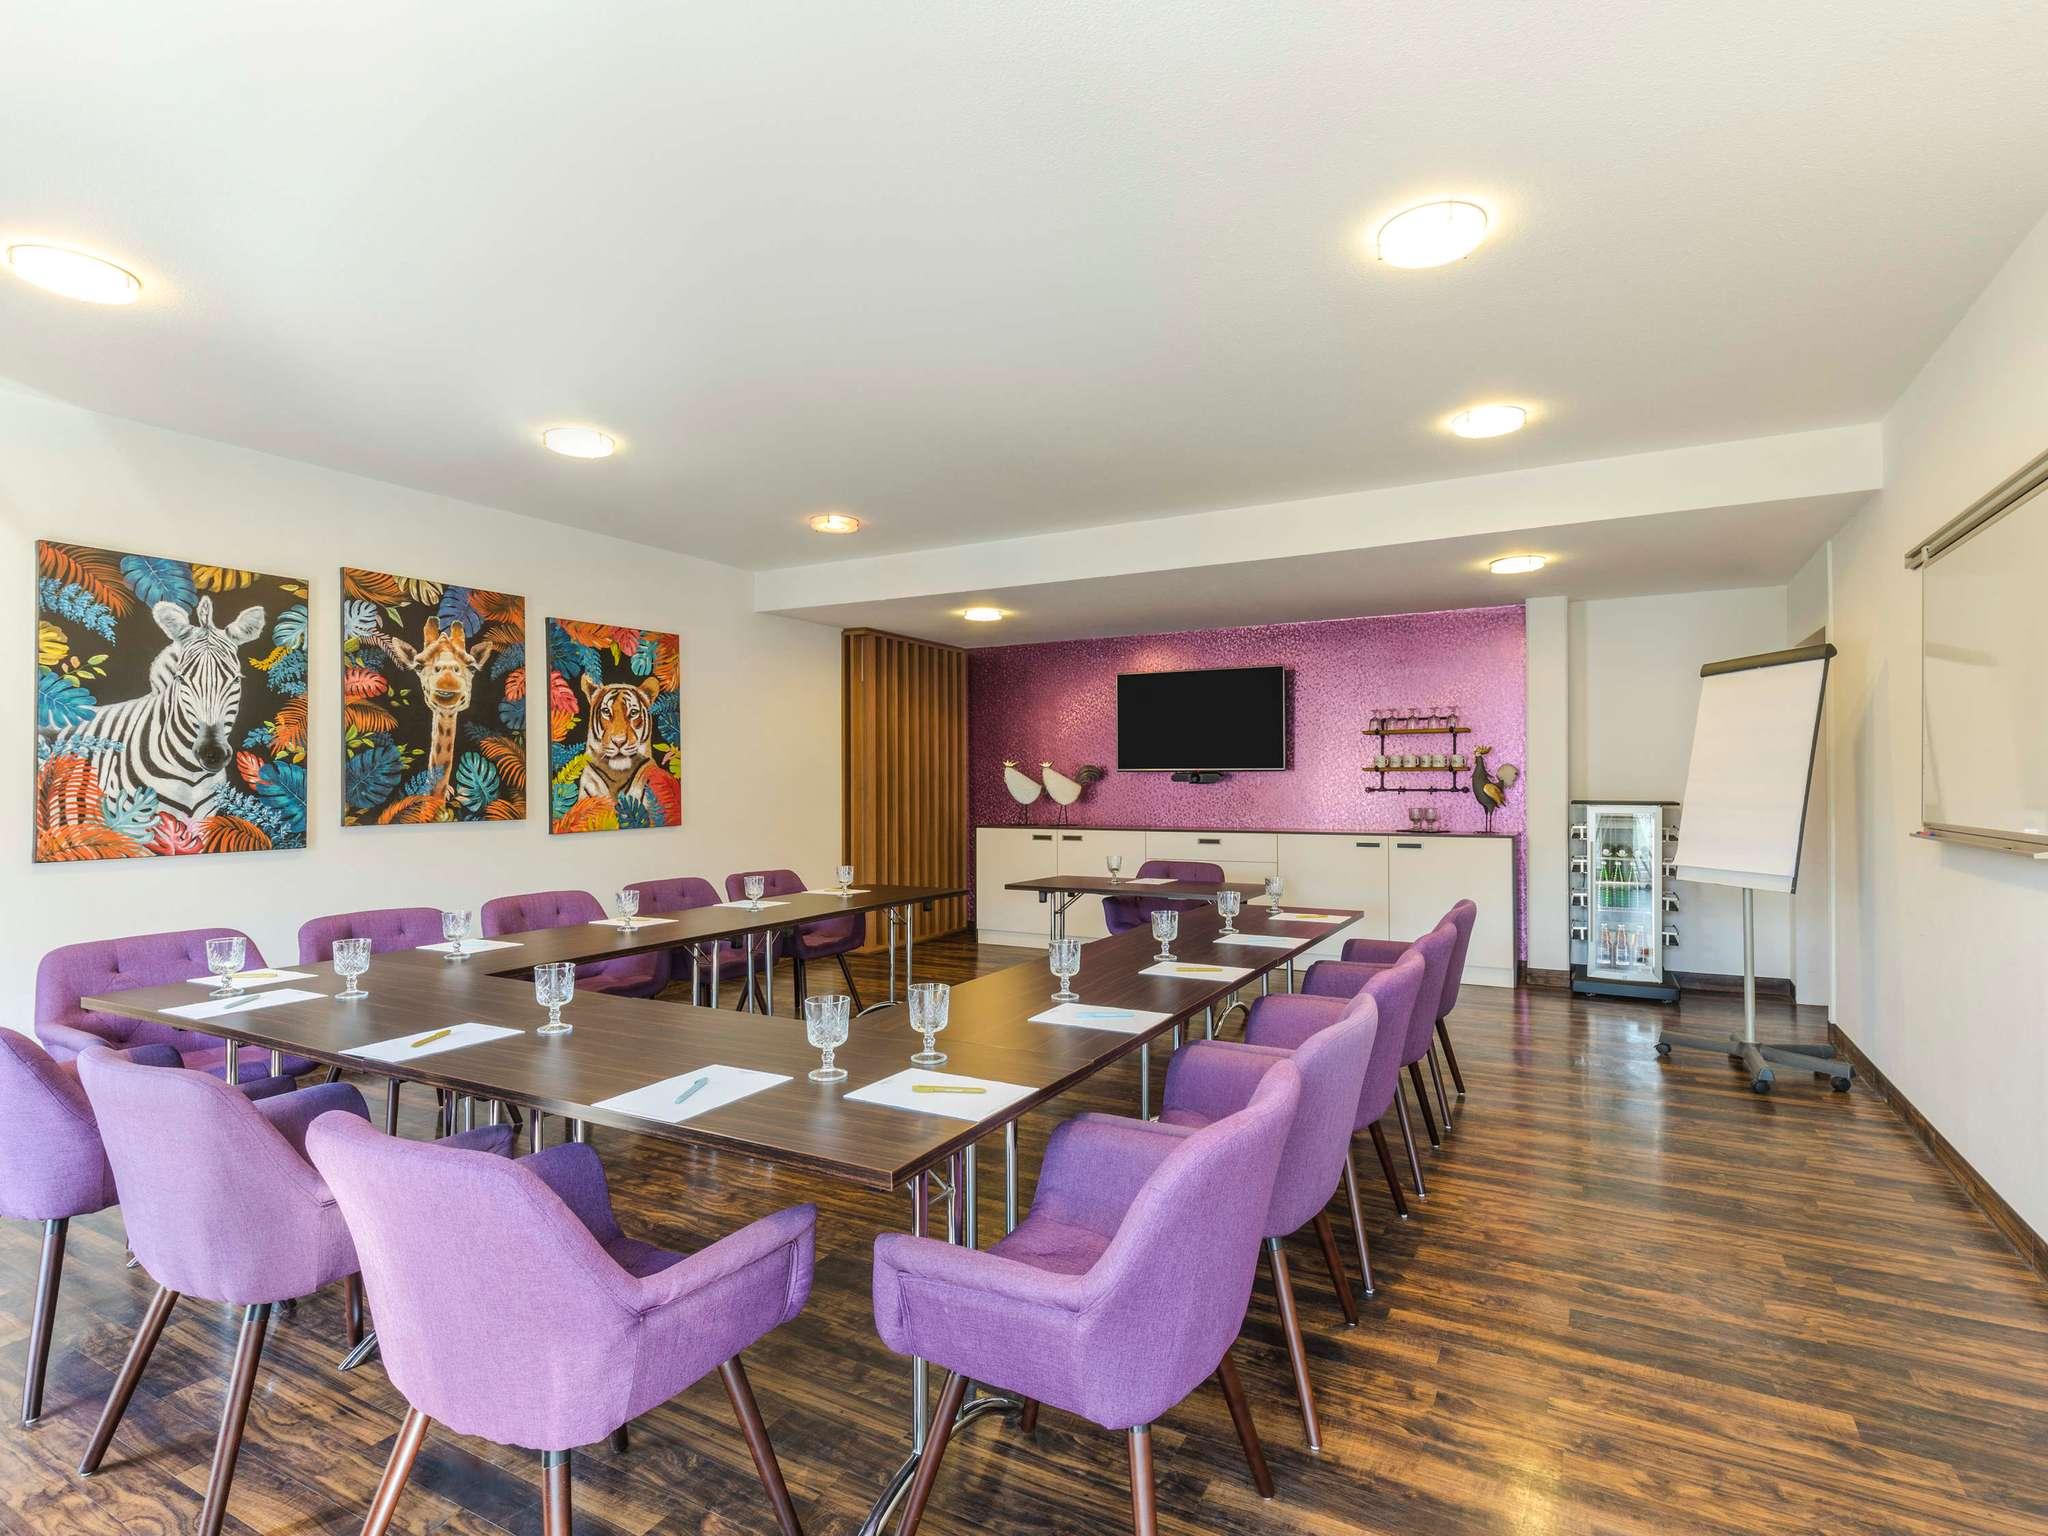 hotel in bad oeynhausen mercure hotel bad oeynhausen. Black Bedroom Furniture Sets. Home Design Ideas